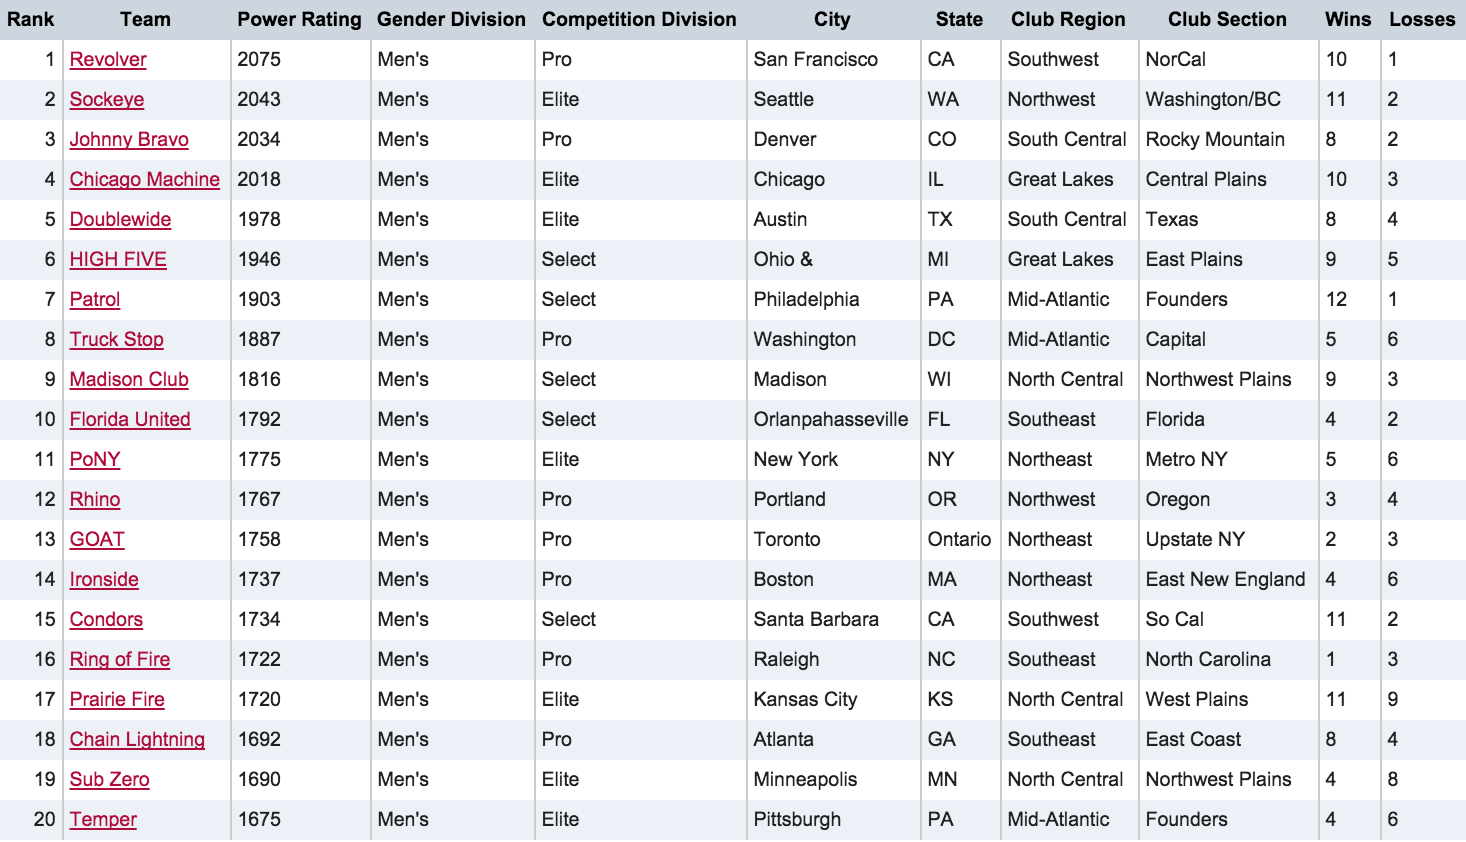 Men's Division Rankings - 8/19/15